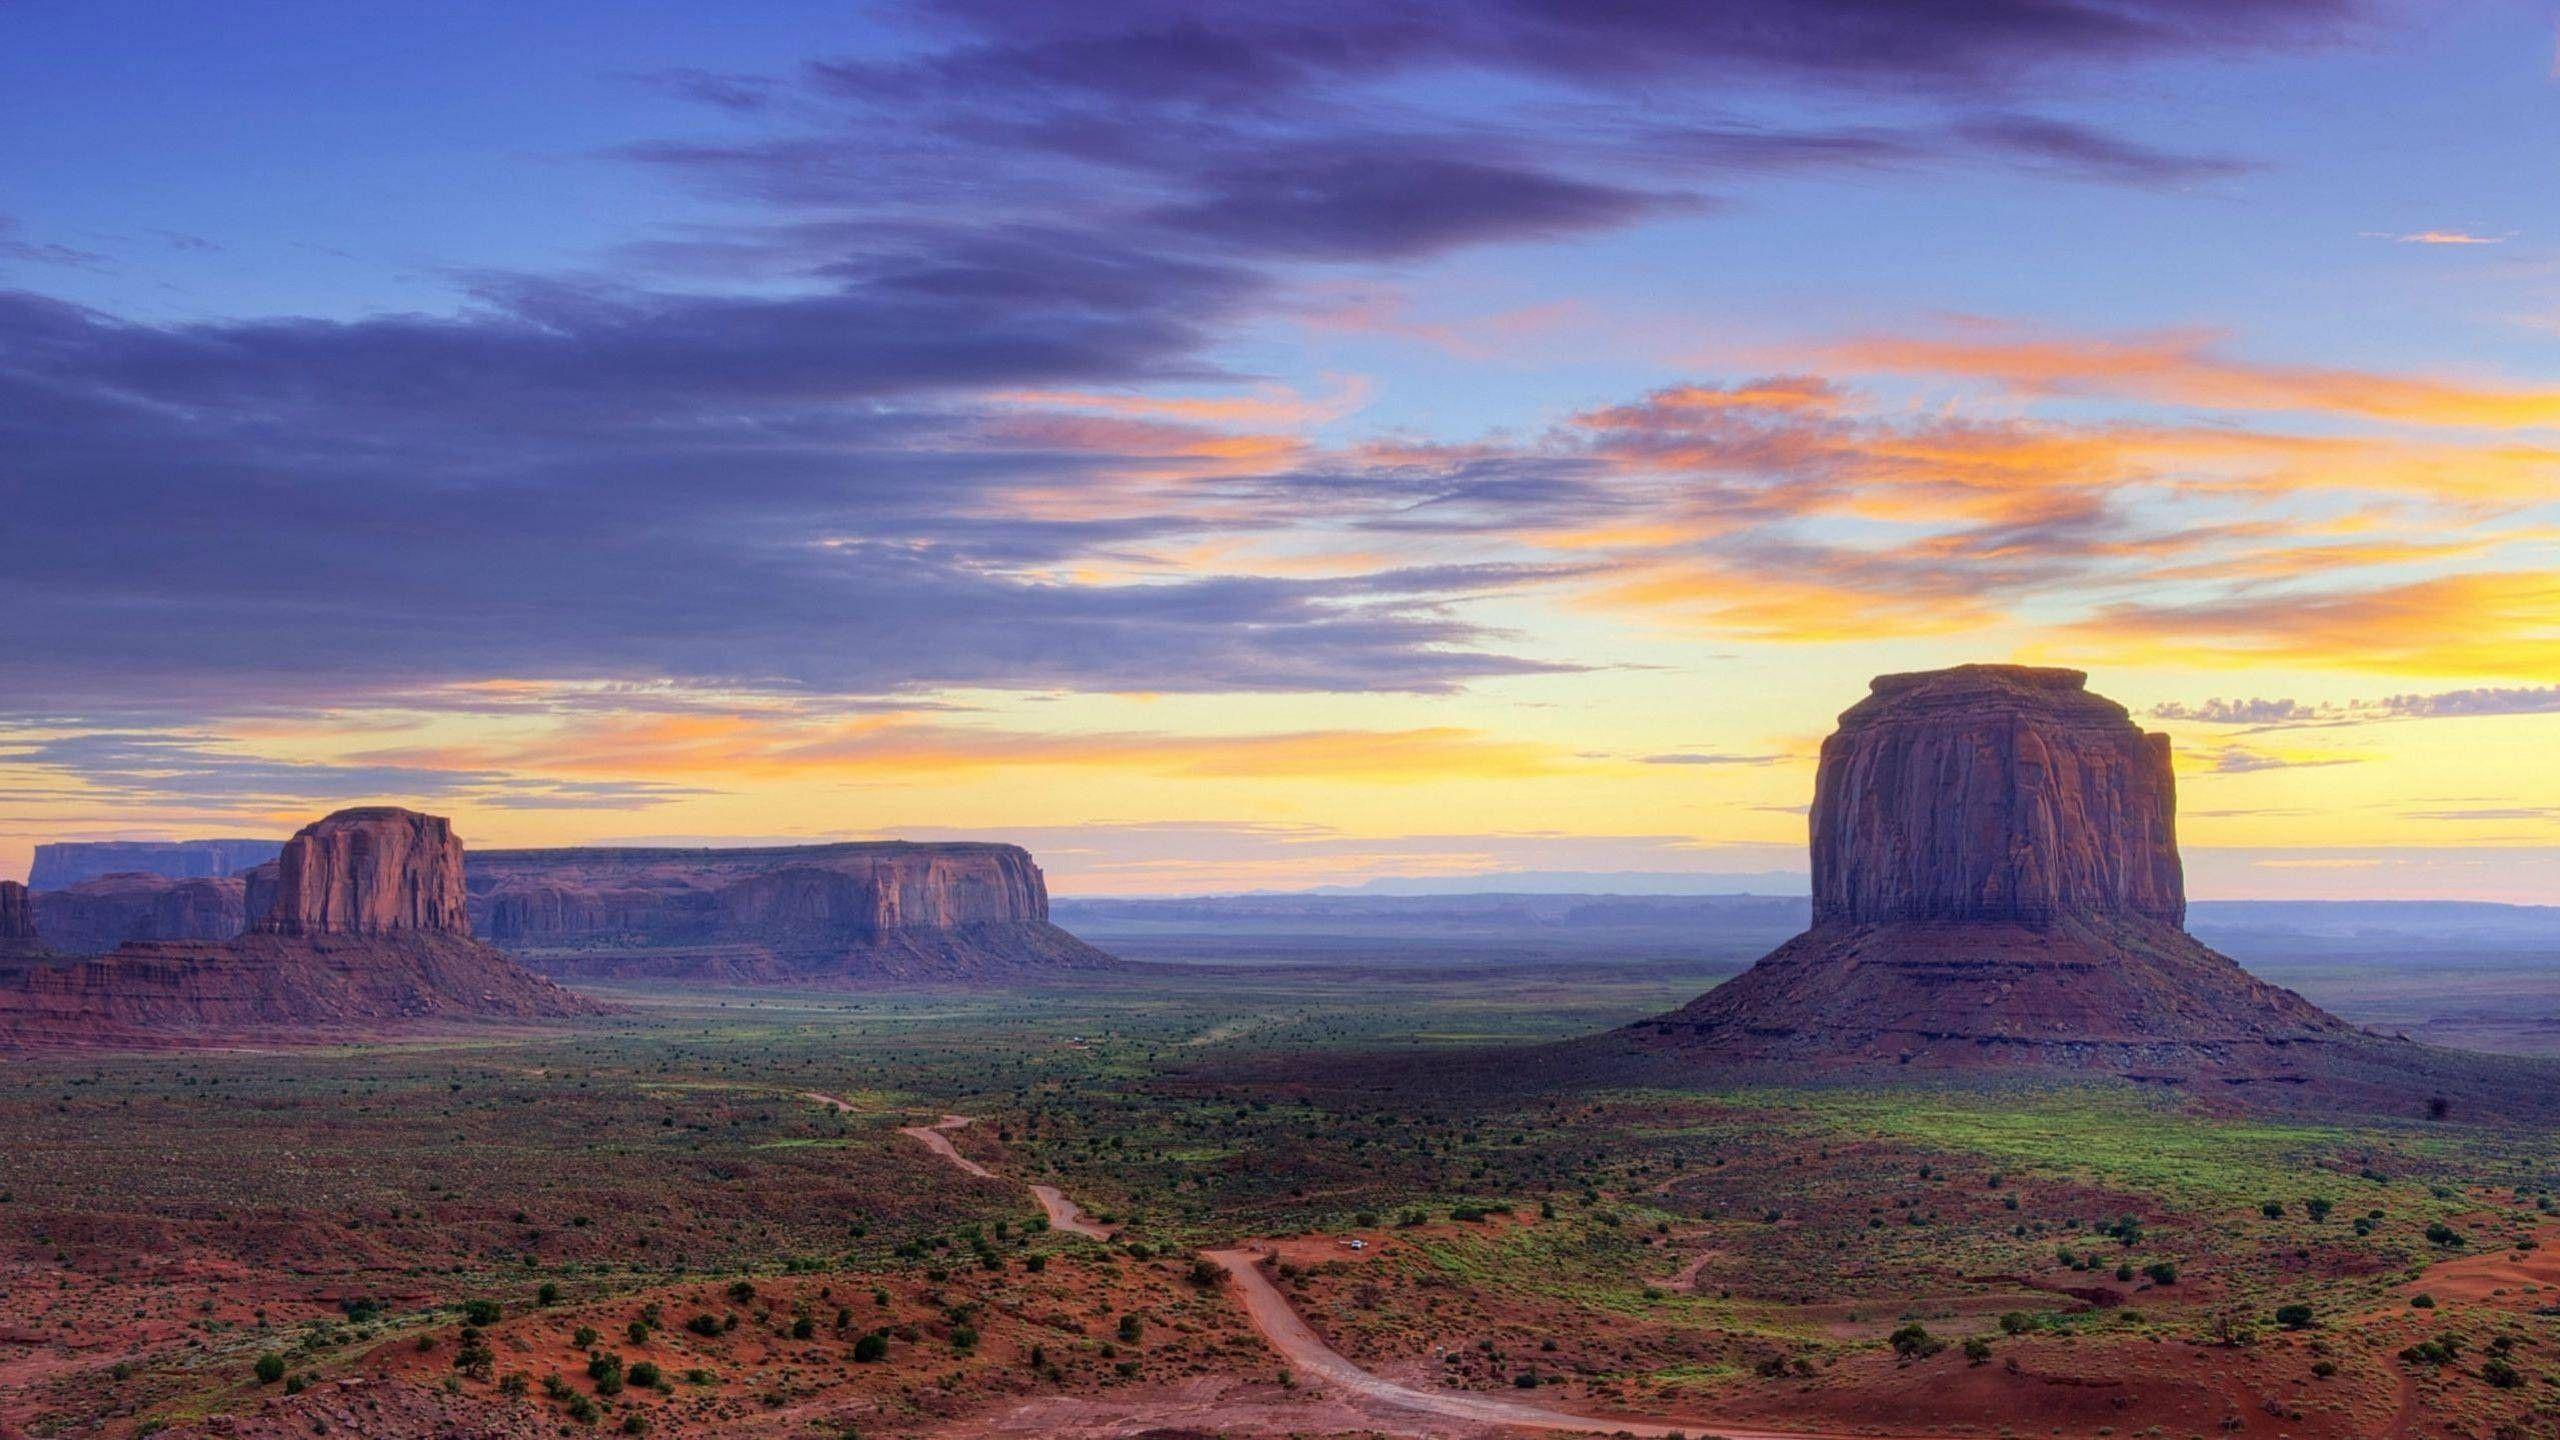 Monument Valley Cool Sunset Fun Nature Desert Mountain Wallpaper Pics